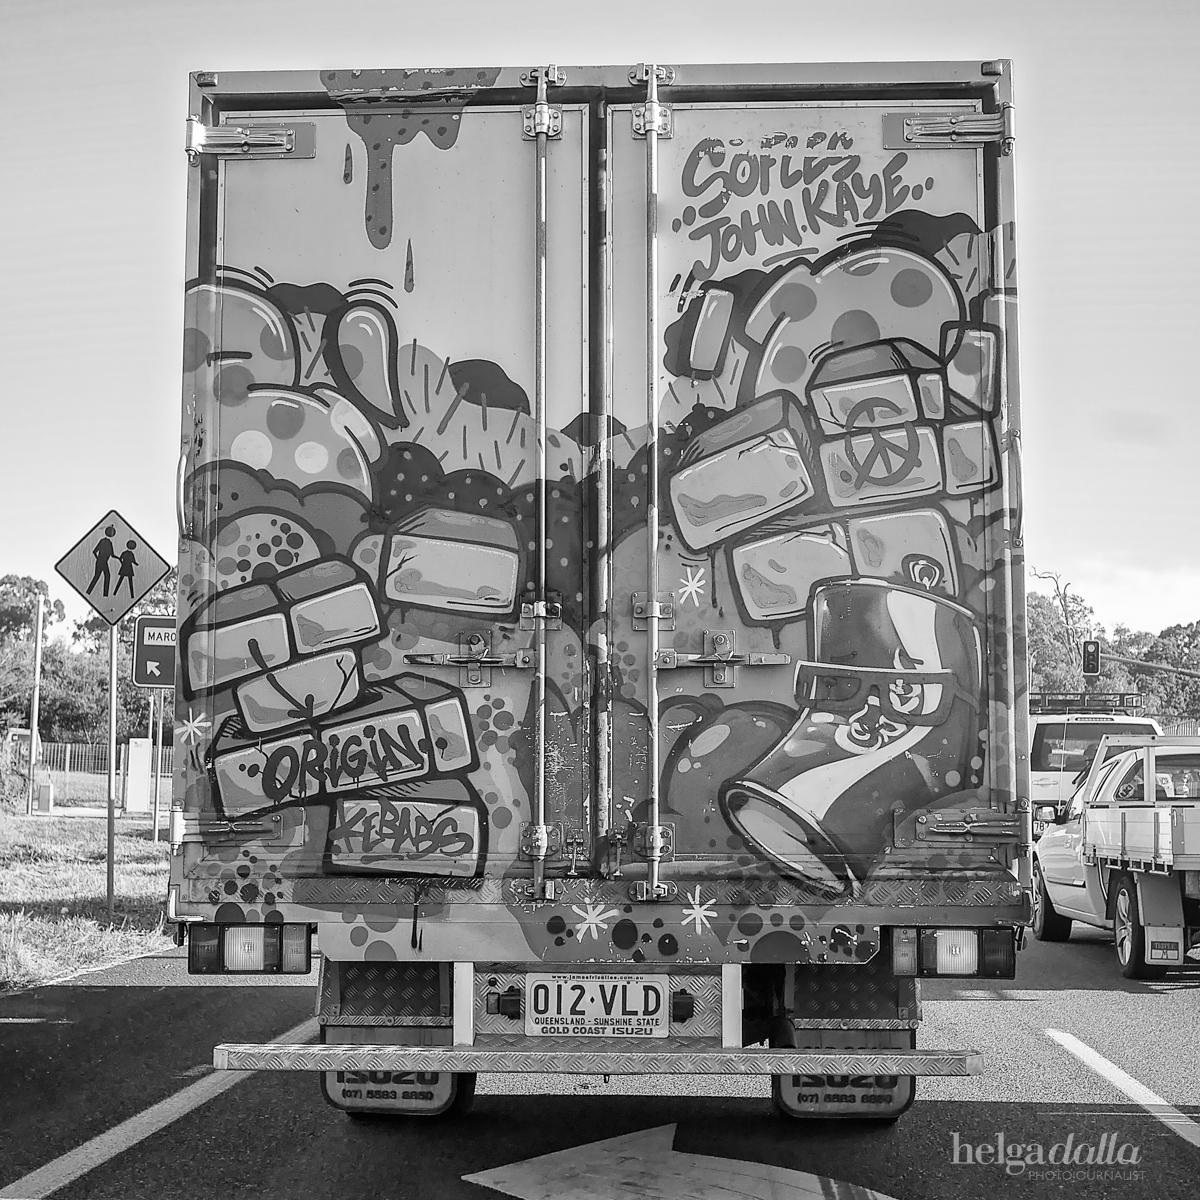 160525 - Truck_Artwork-1 WM